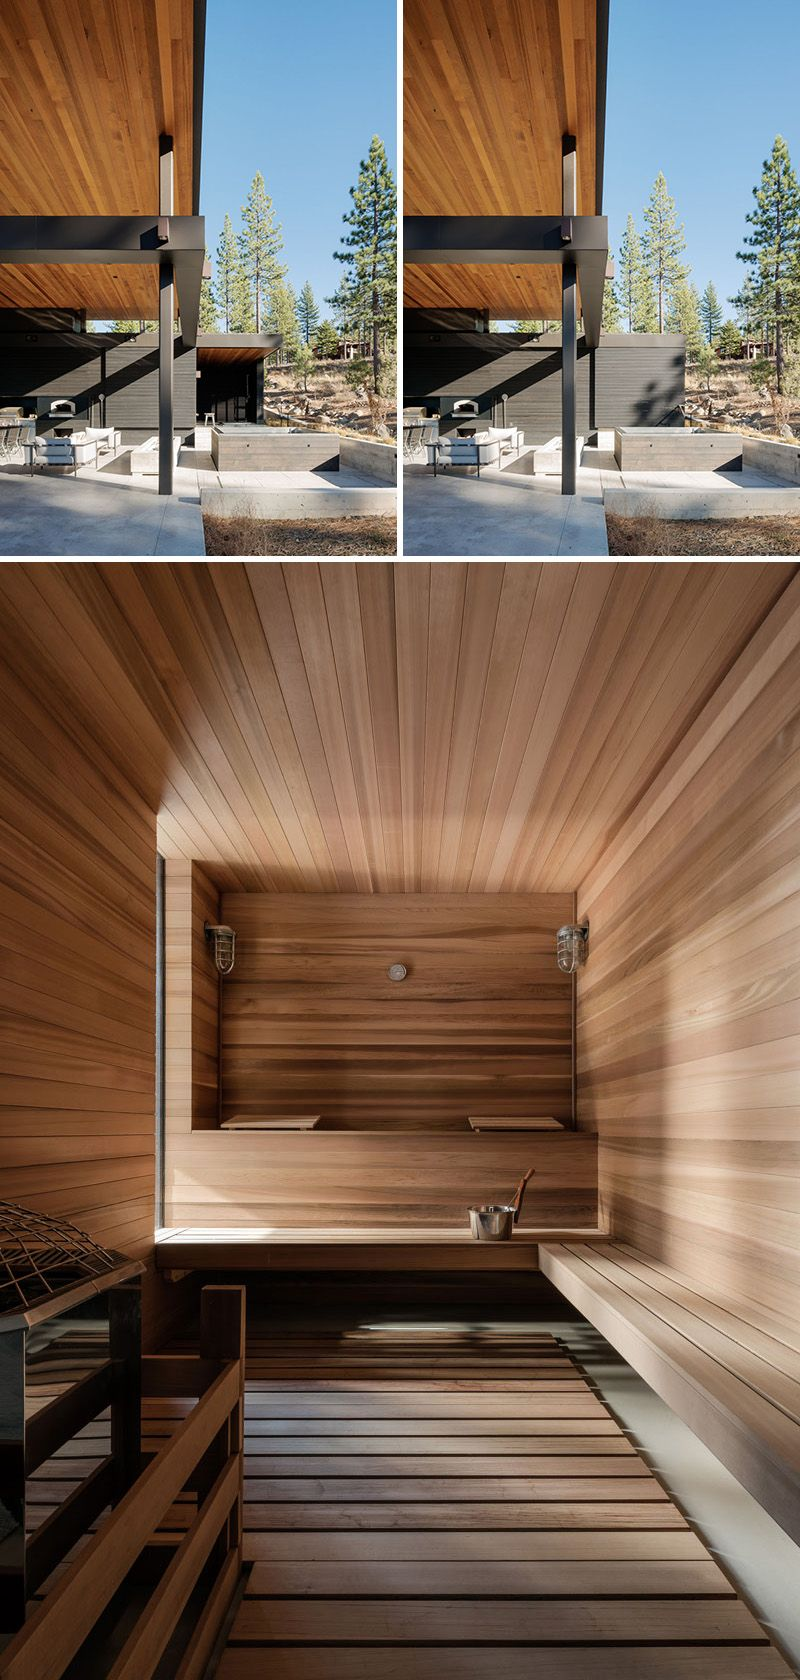 best images about maison architecture on pinterest soaking